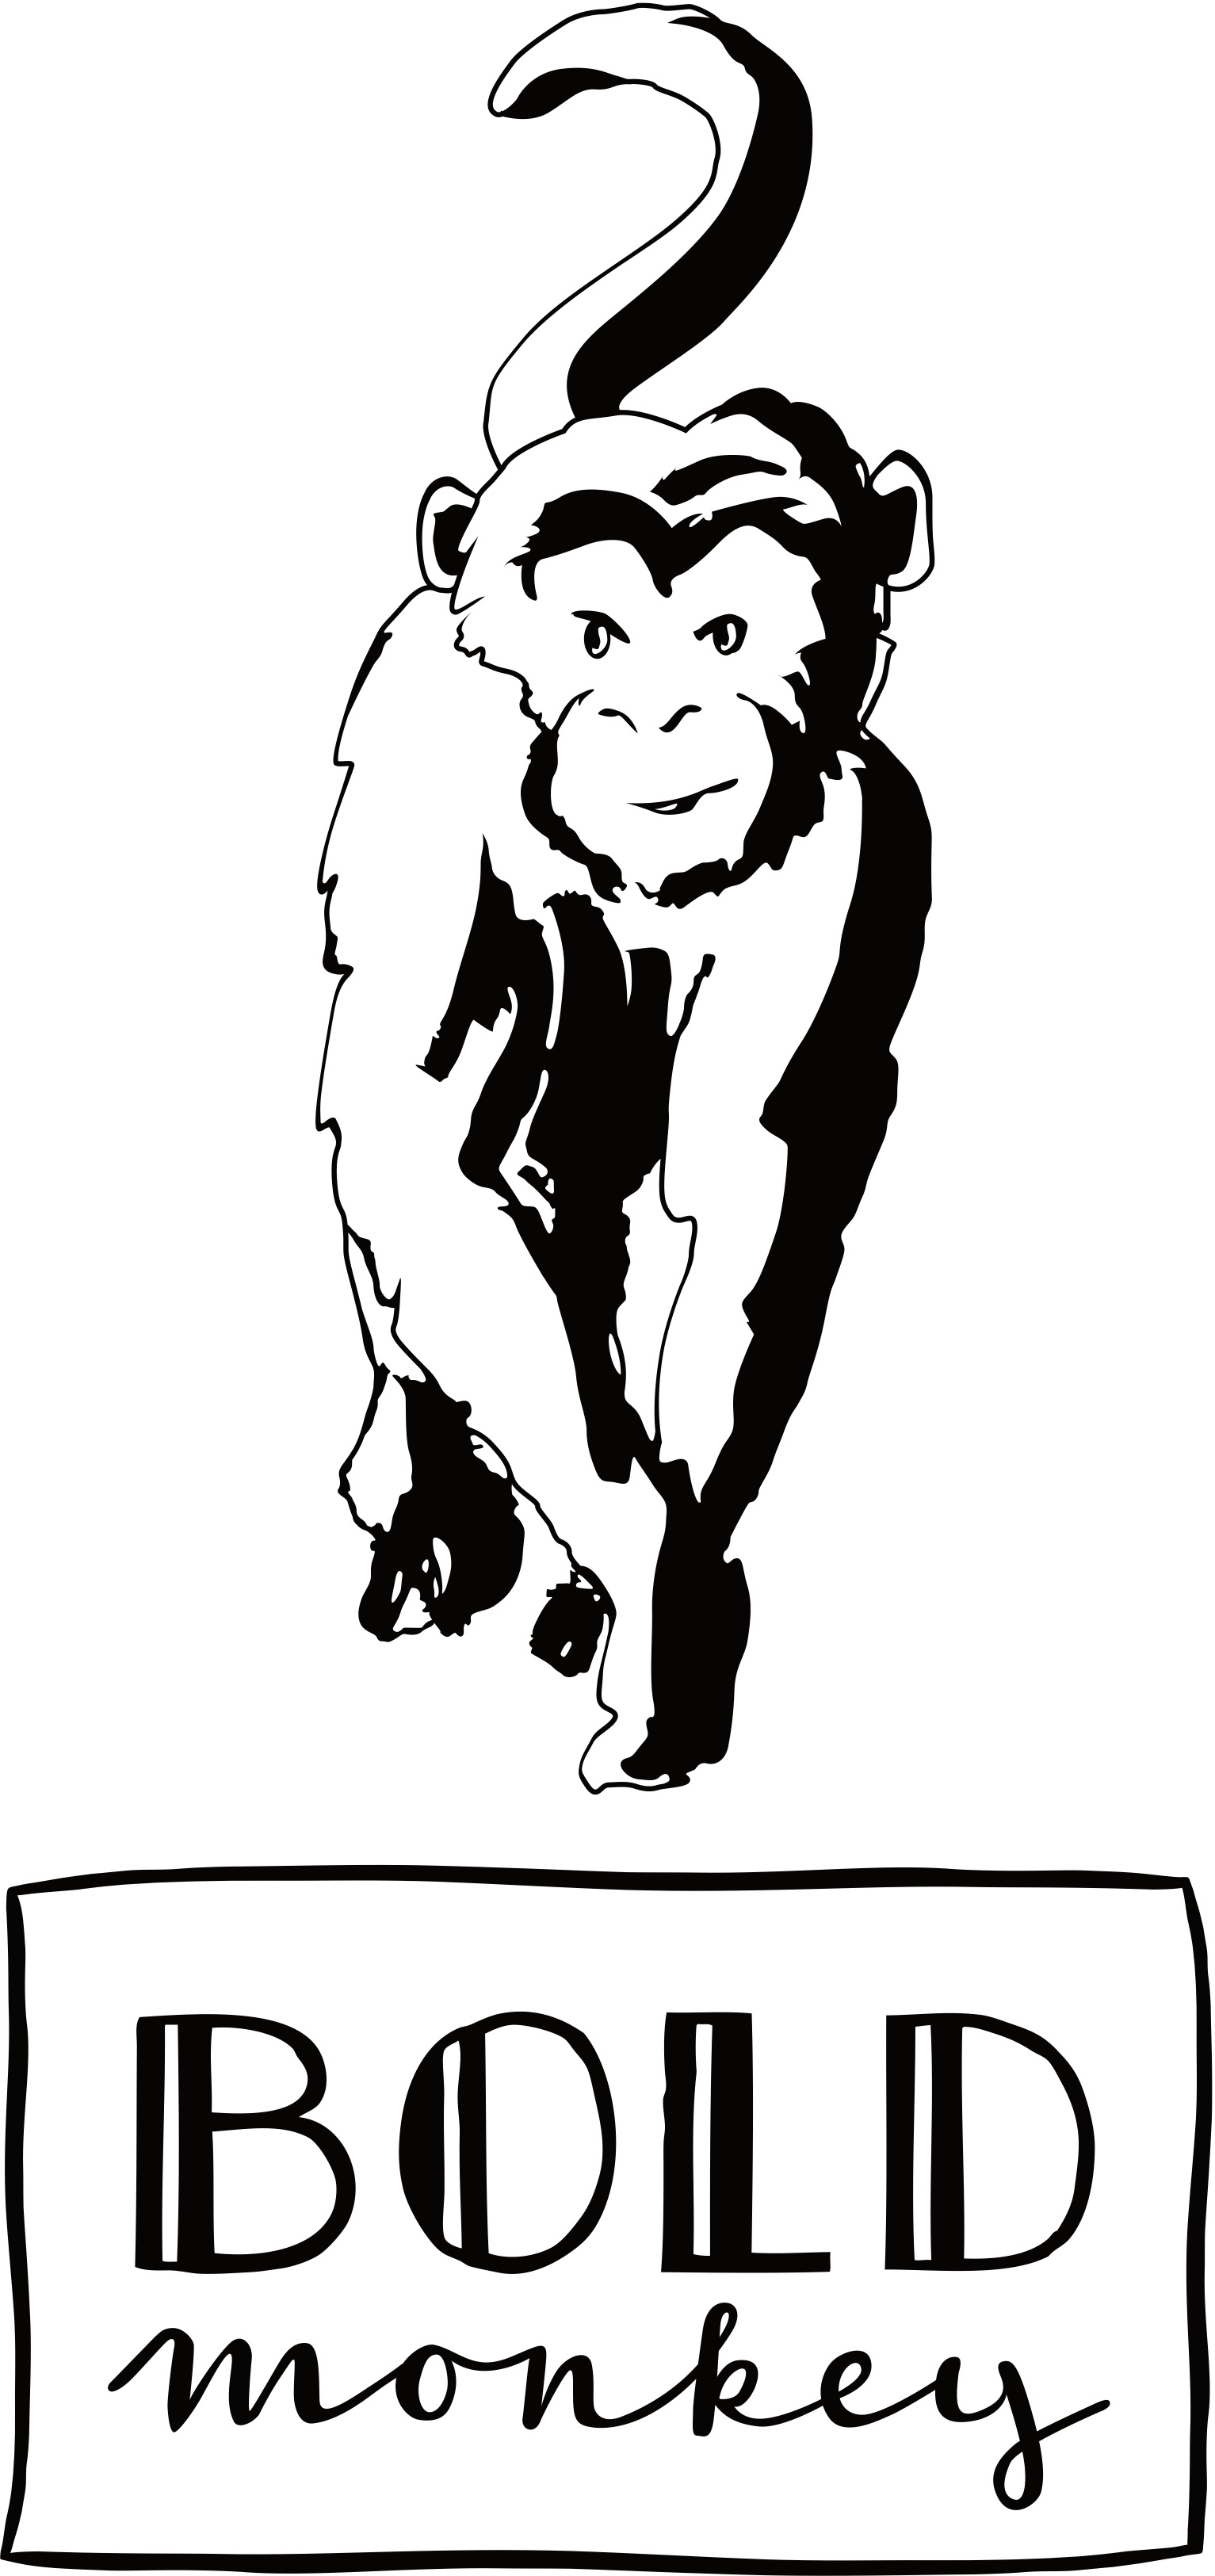 Bold Monkey Where The Sun Doesn't Shine loungestoel panter draaivoet draaibaar gouden onderstel panterprint